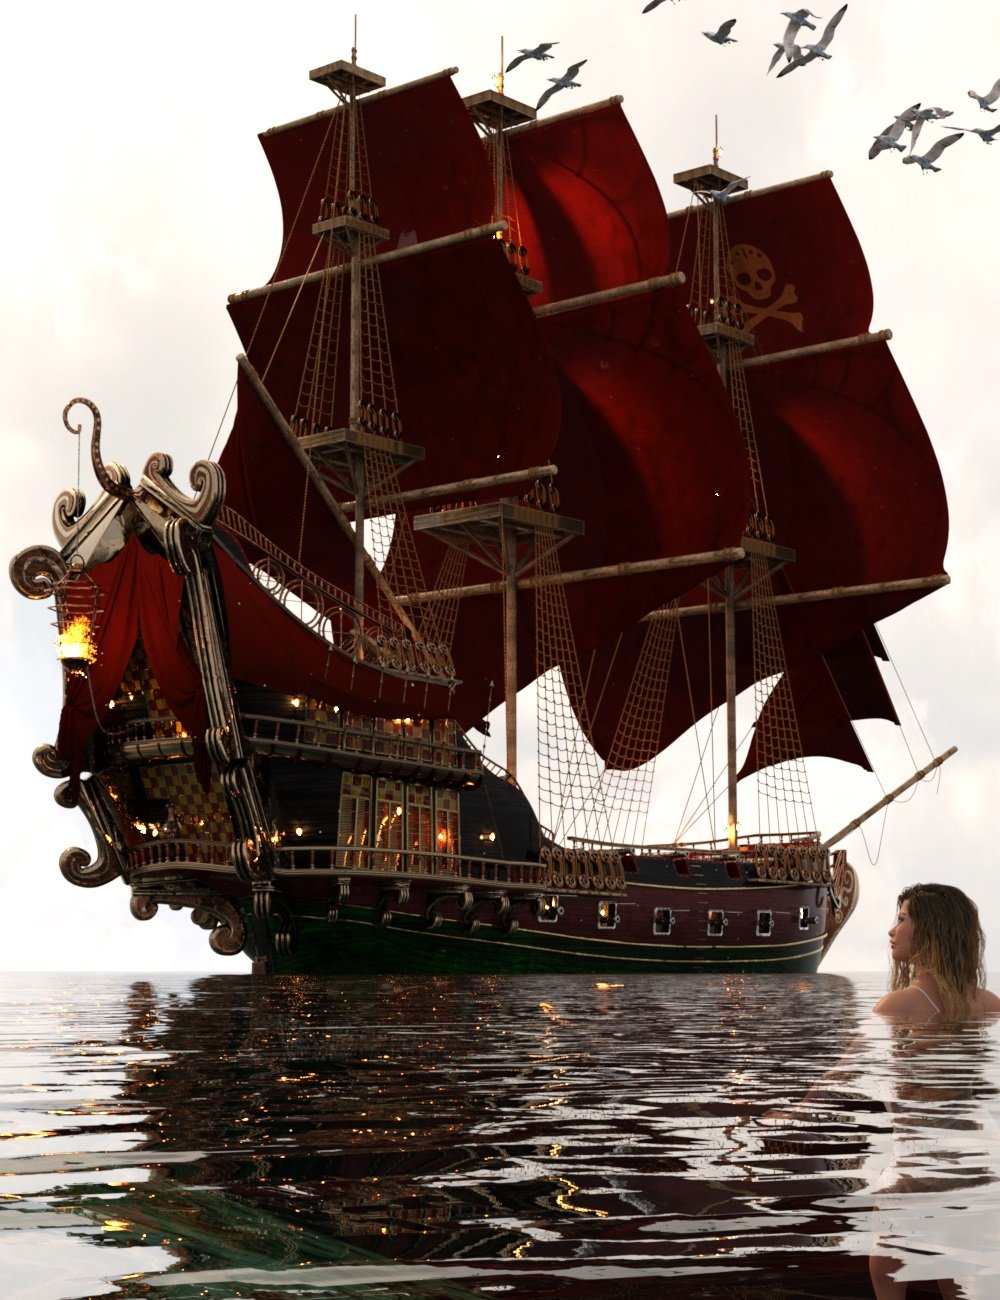 PW Pirate Ship Poseidon by: PW Productions, 3D Models by Daz 3D